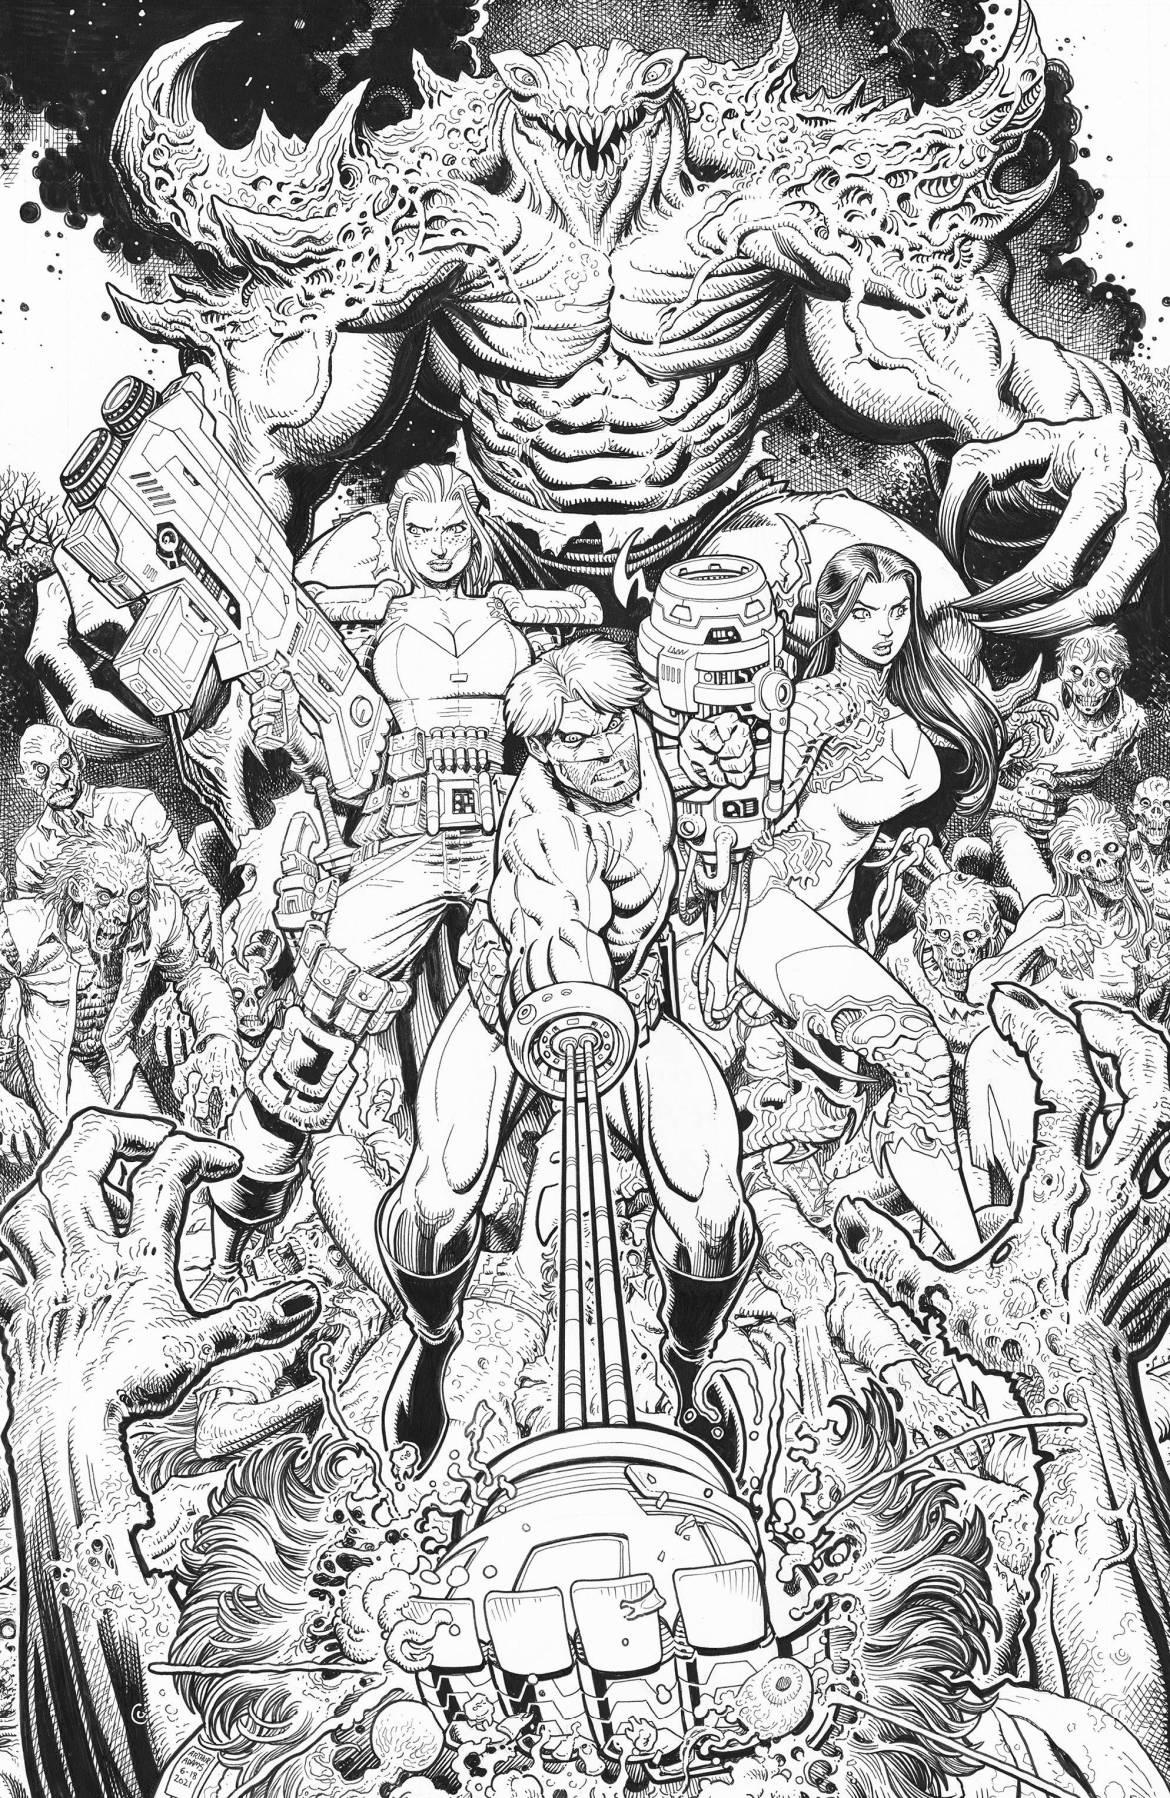 STL198533 ComicList: Image Comics New Releases for 07/21/2021